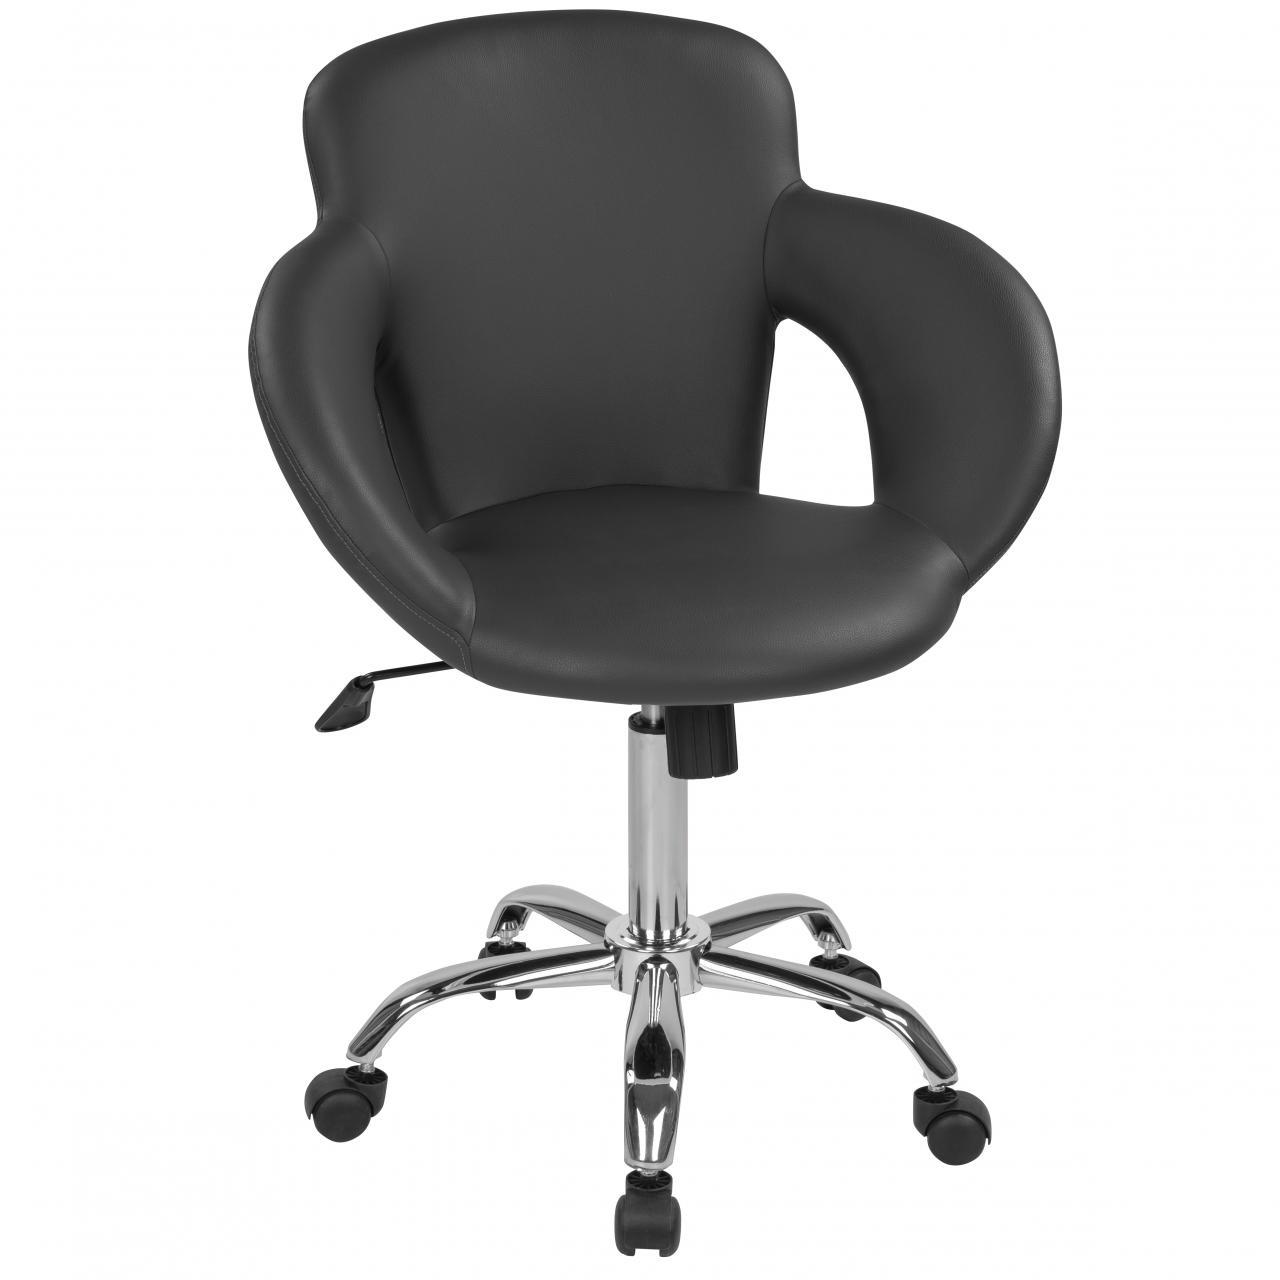 Design drehstuhl b rostuhl schreibtischstuhl rollhocker for Design schreibtischstuhl